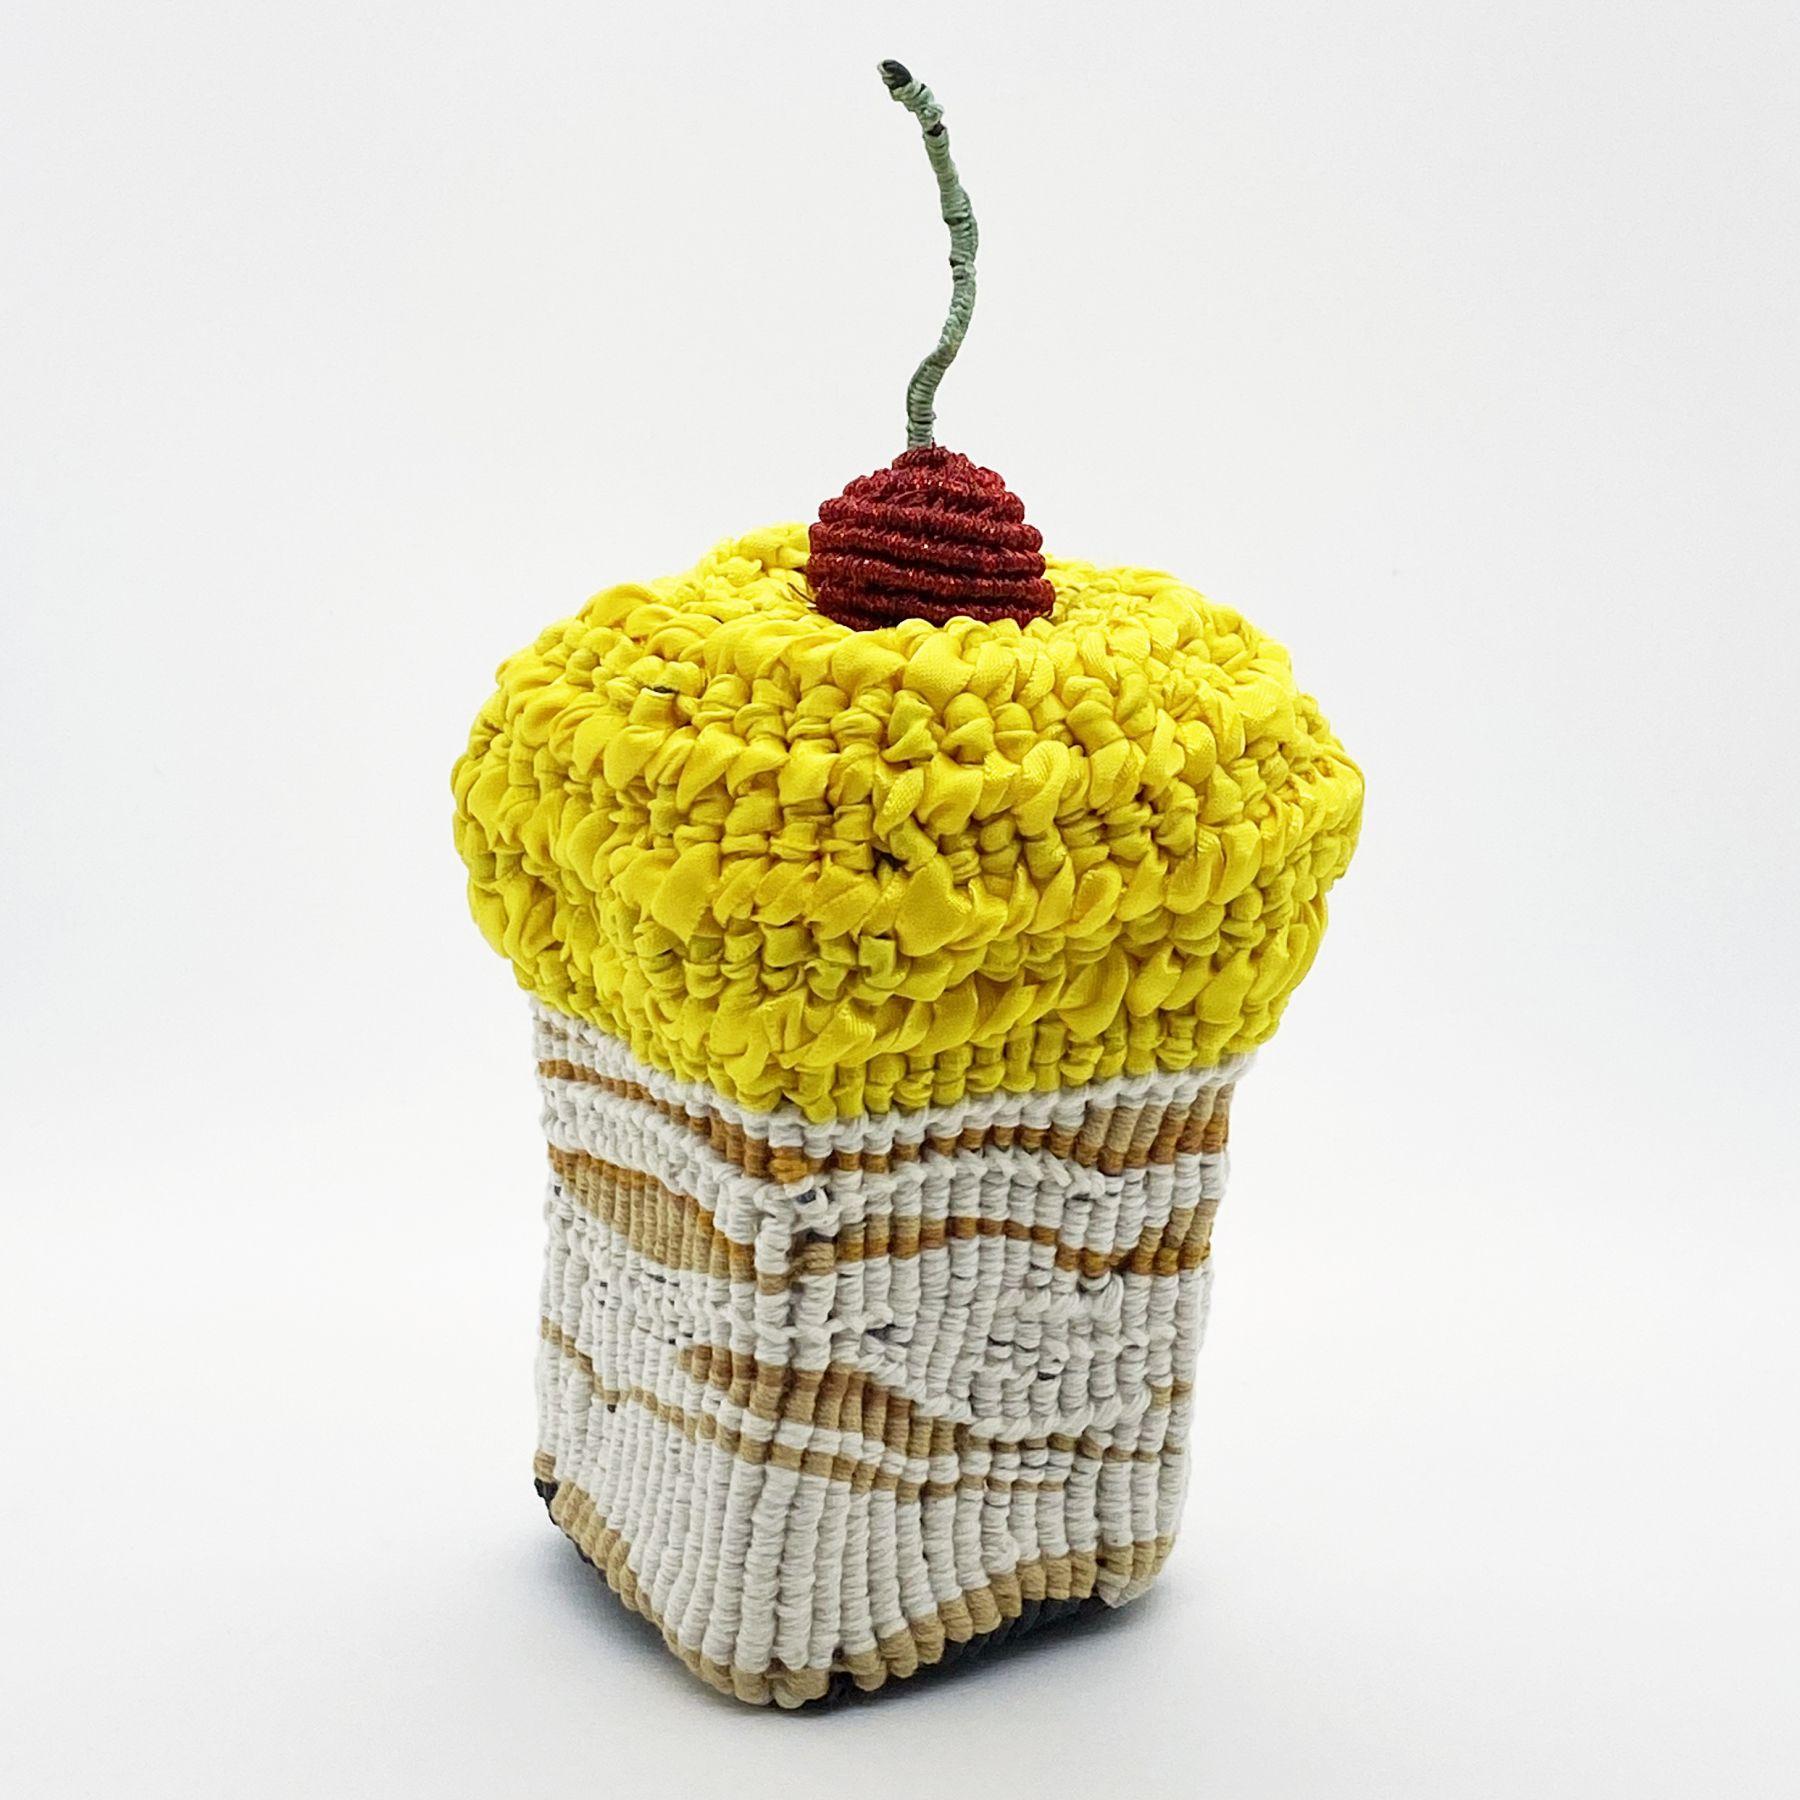 "Lemon Icing, 8"" x 4"" x 4"", Cotton, Ribbon, Metallic Thread And Polyester Cording"